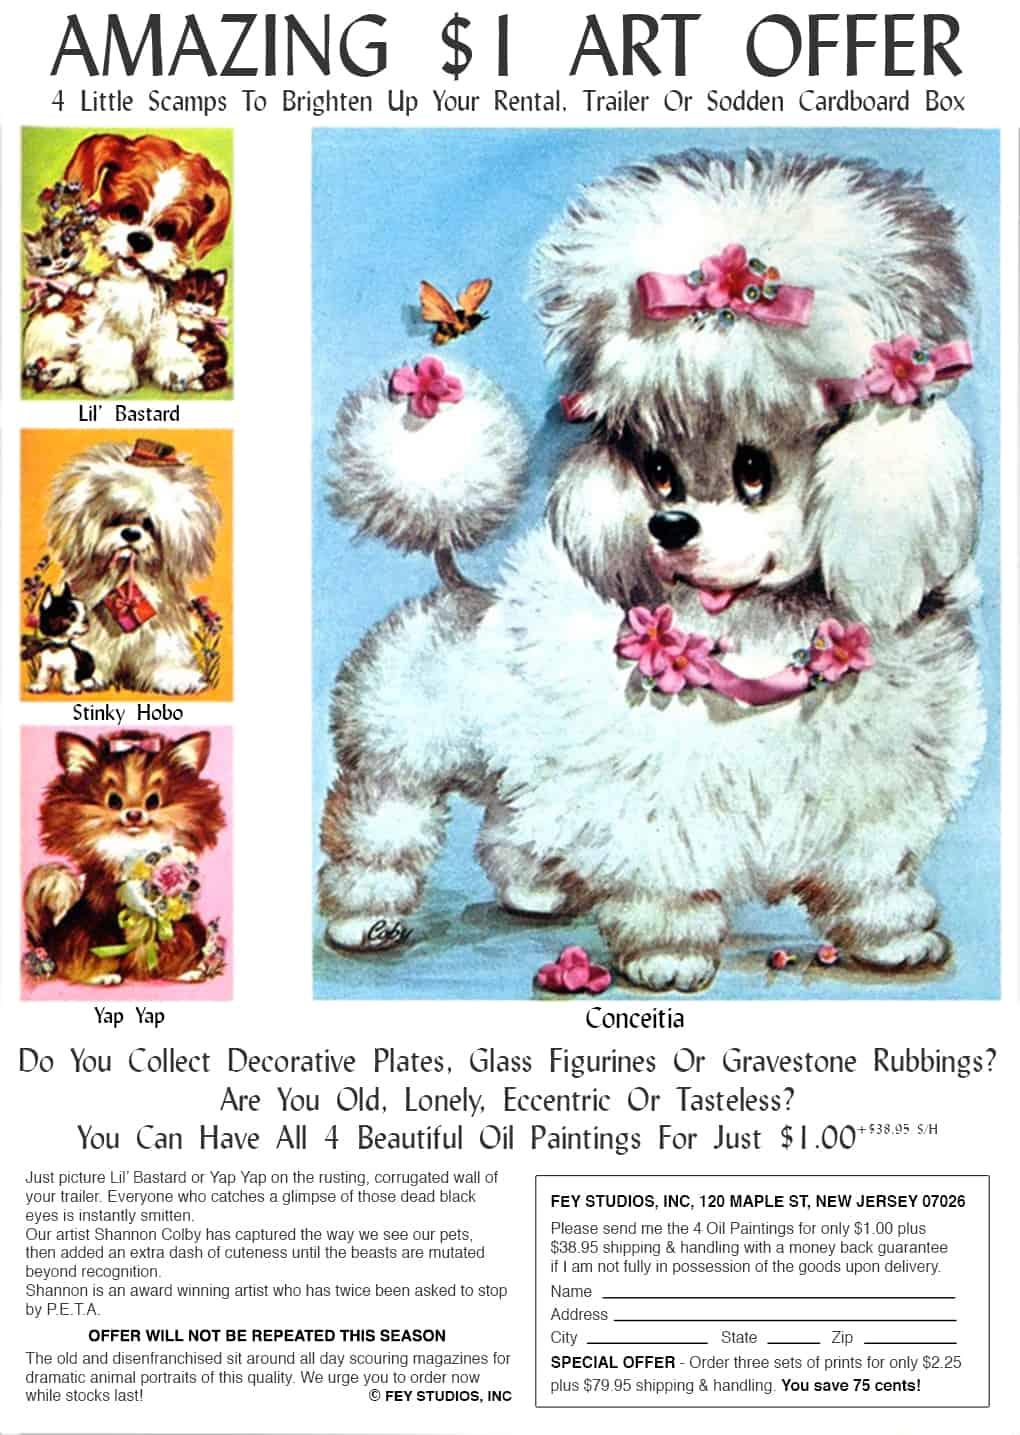 Amazing $1 Art Offer Advert